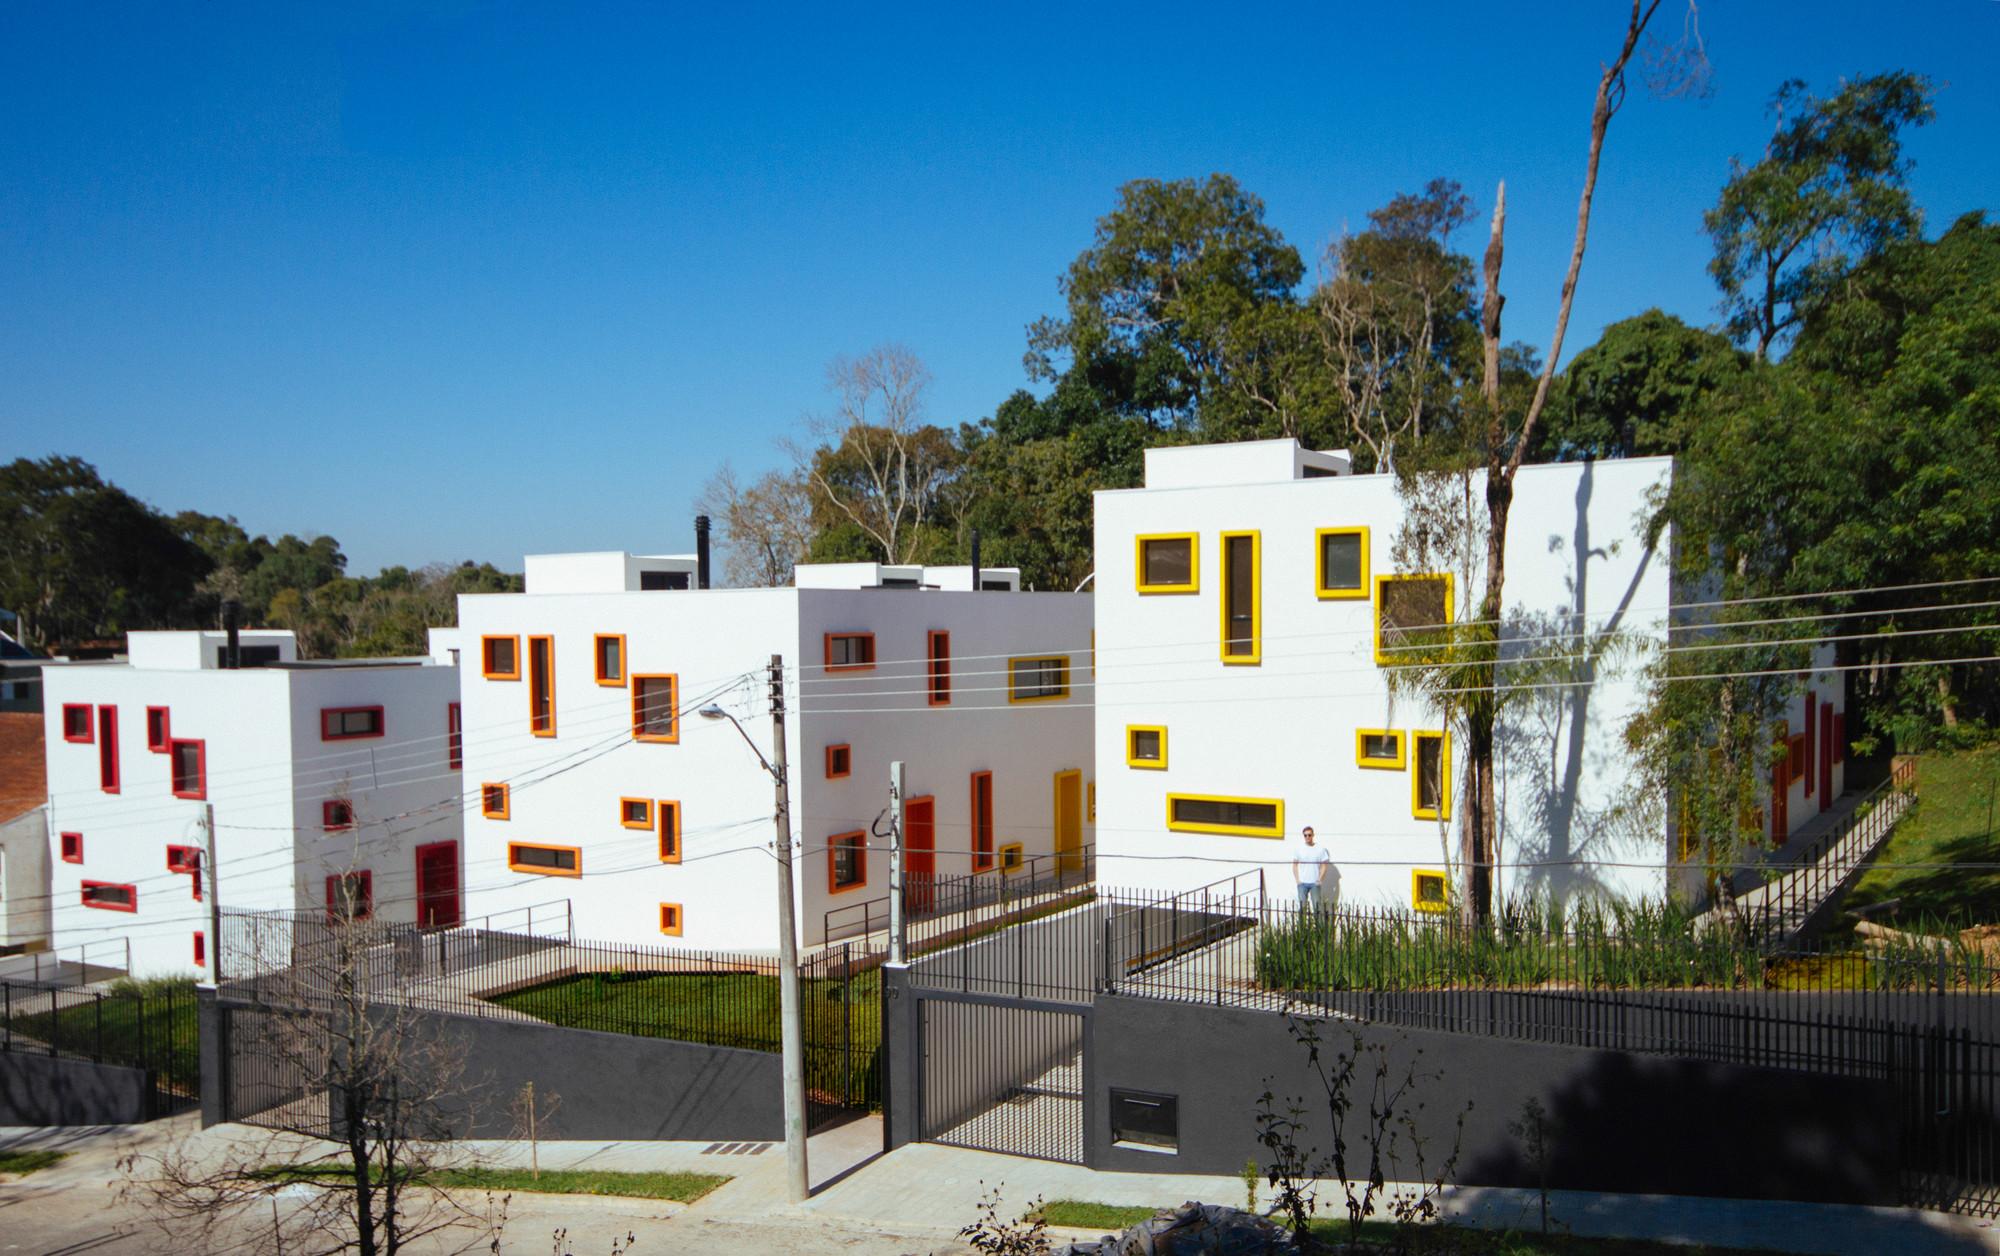 Cube Houses / Aleph Zero + Studio Juliano Monteiro, © Felipe Gomes